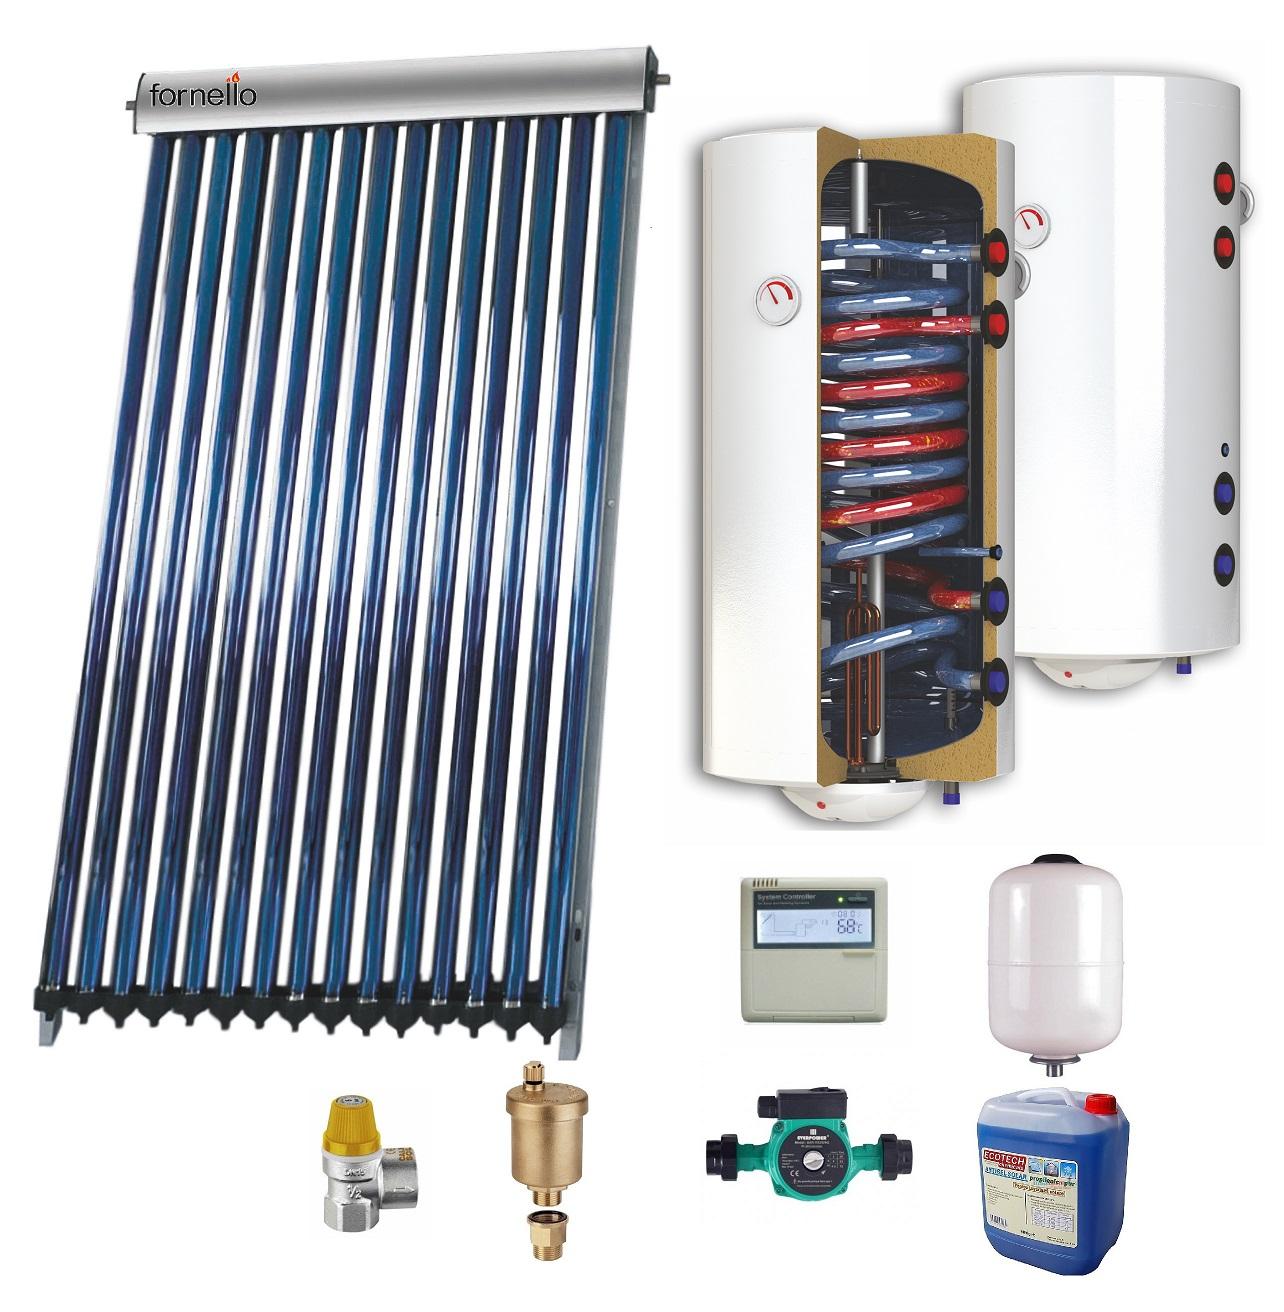 Sistem solar presurizat , panou Sunsystem VTC 20, boiler cu 2 serpentine si rezistenta electrica Sunsystem 150 litri, pompa 25-60, controller, vas expansiune, antigel, supapa 1/2, aerisitor 1/2 imagine fornello.ro